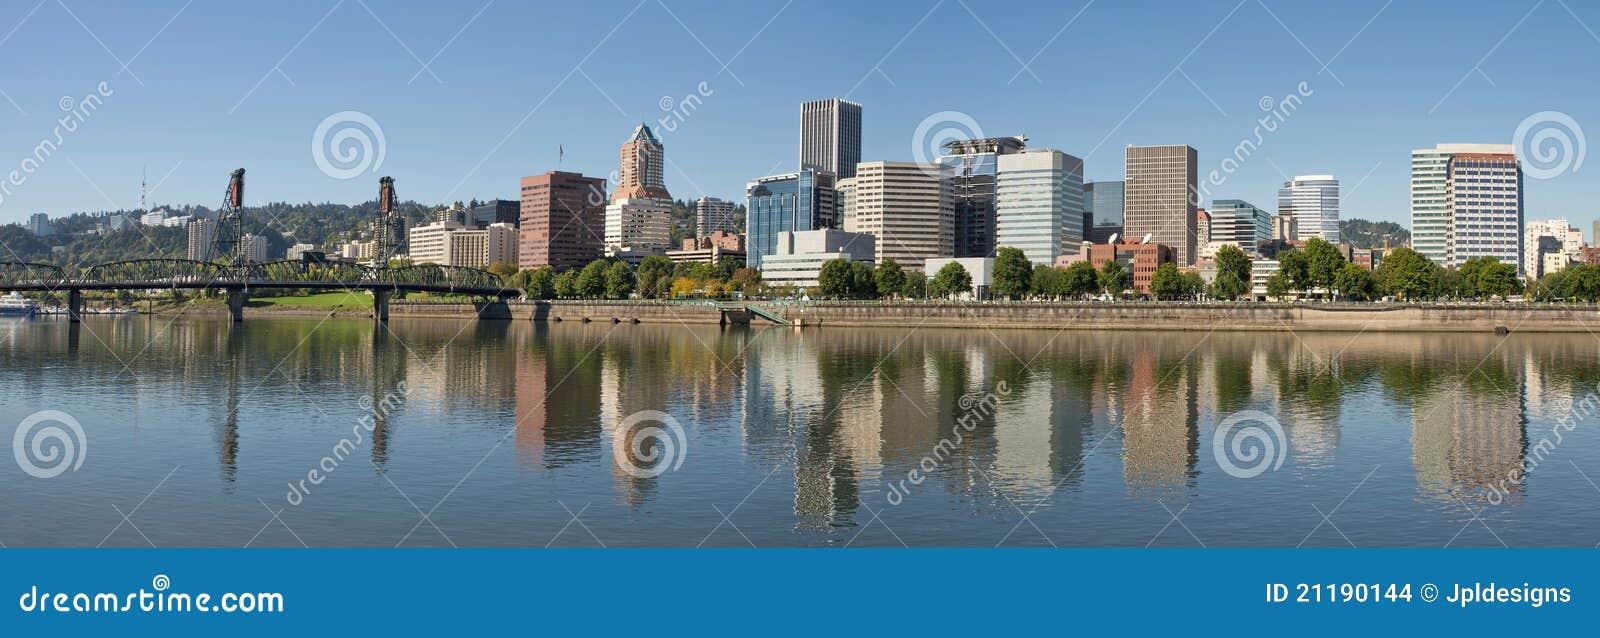 Portland Downtown Waterfront Skyline Panorama